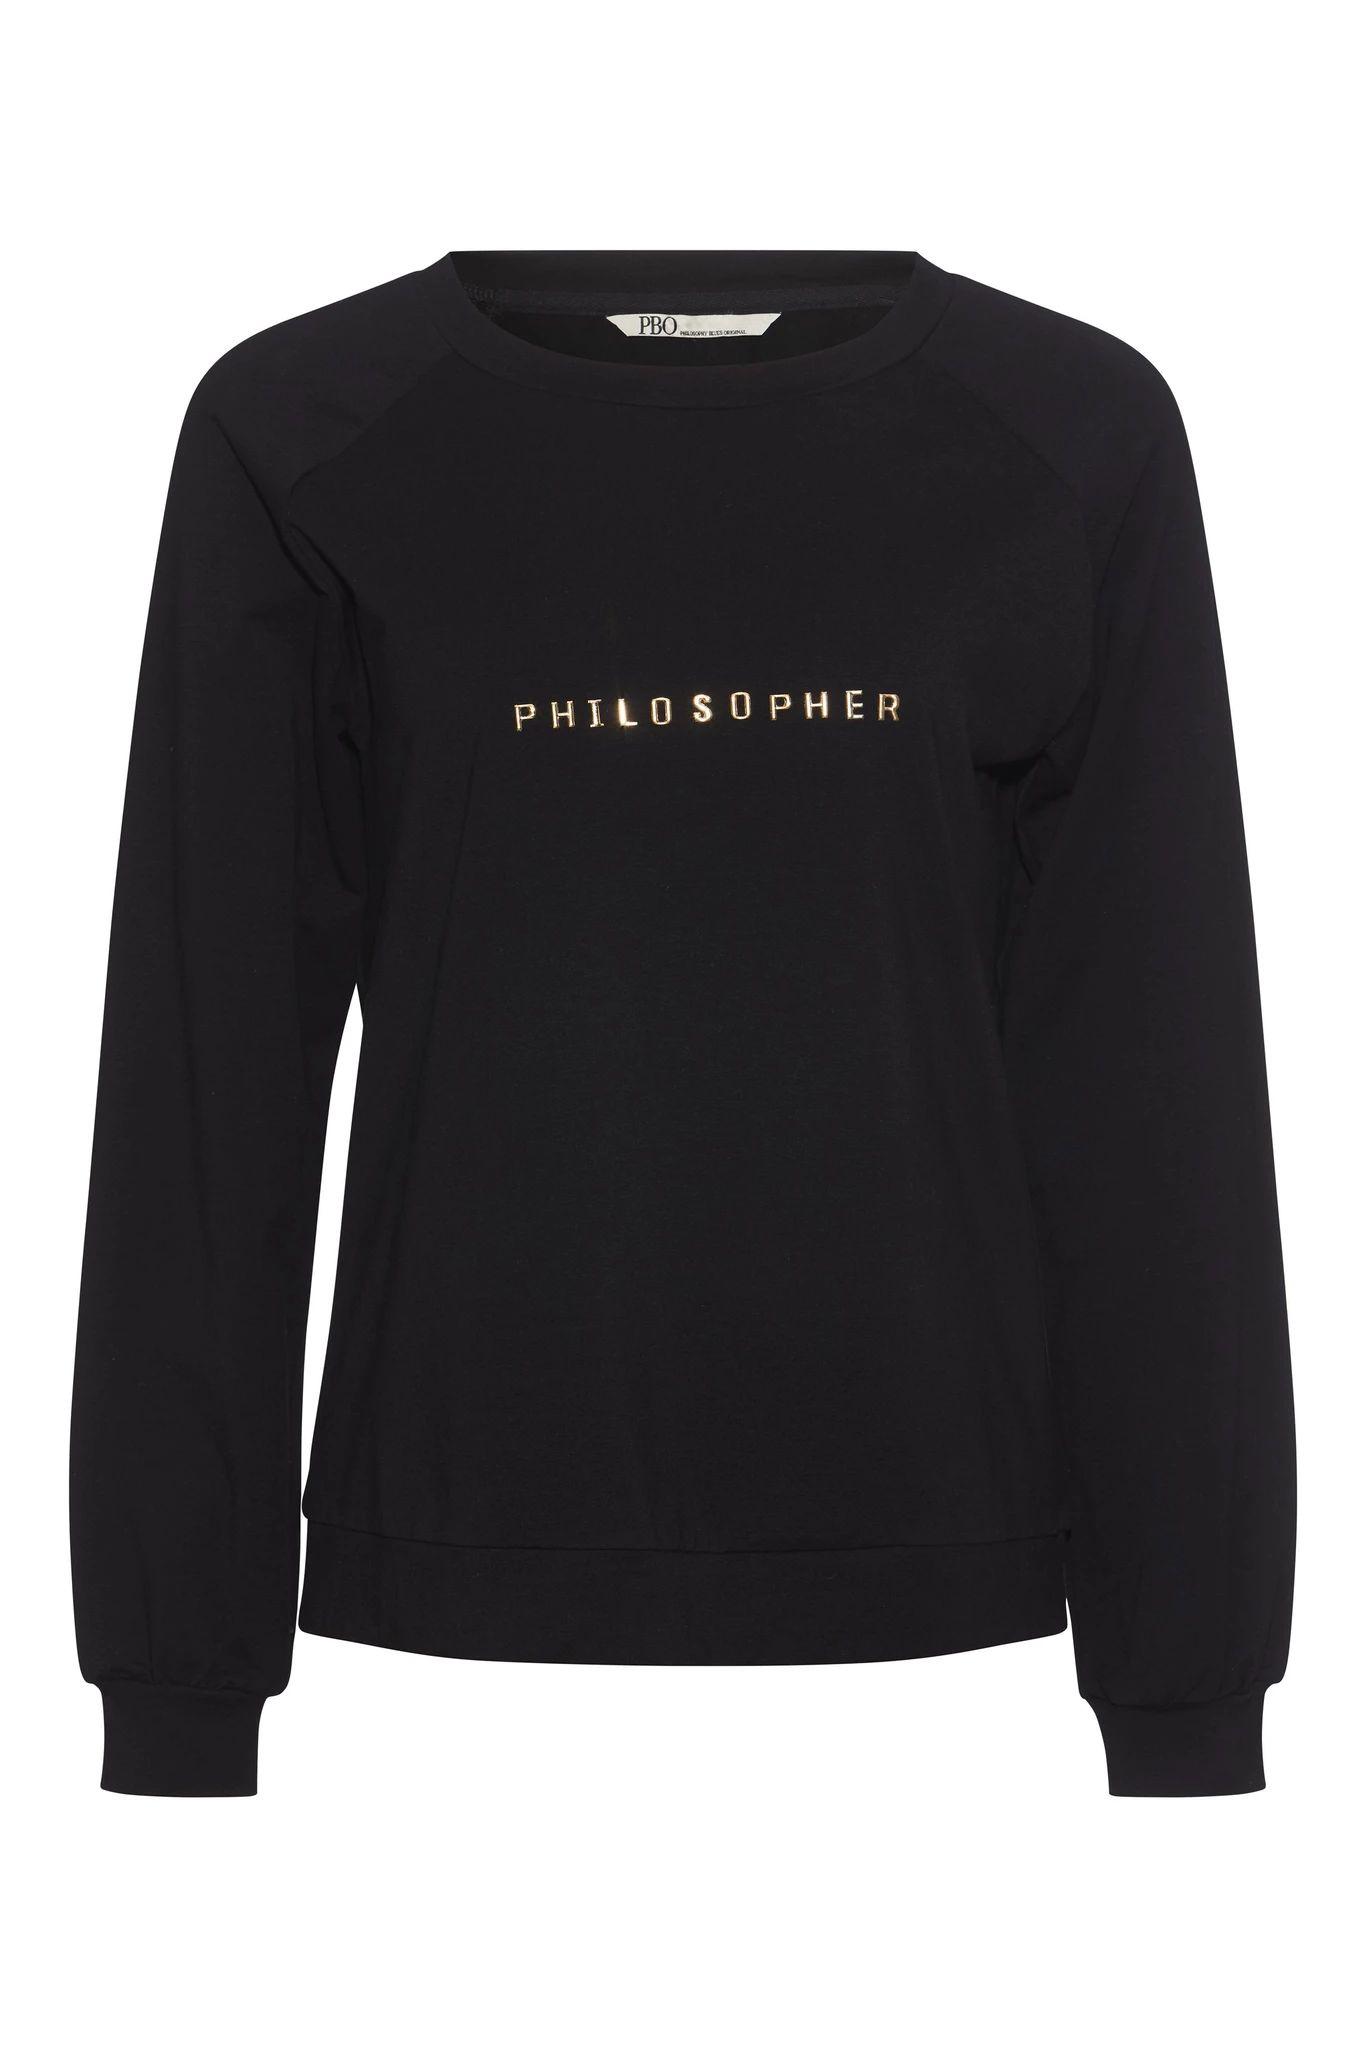 PBO 2391 Folsom sweatshirts, black, x-small